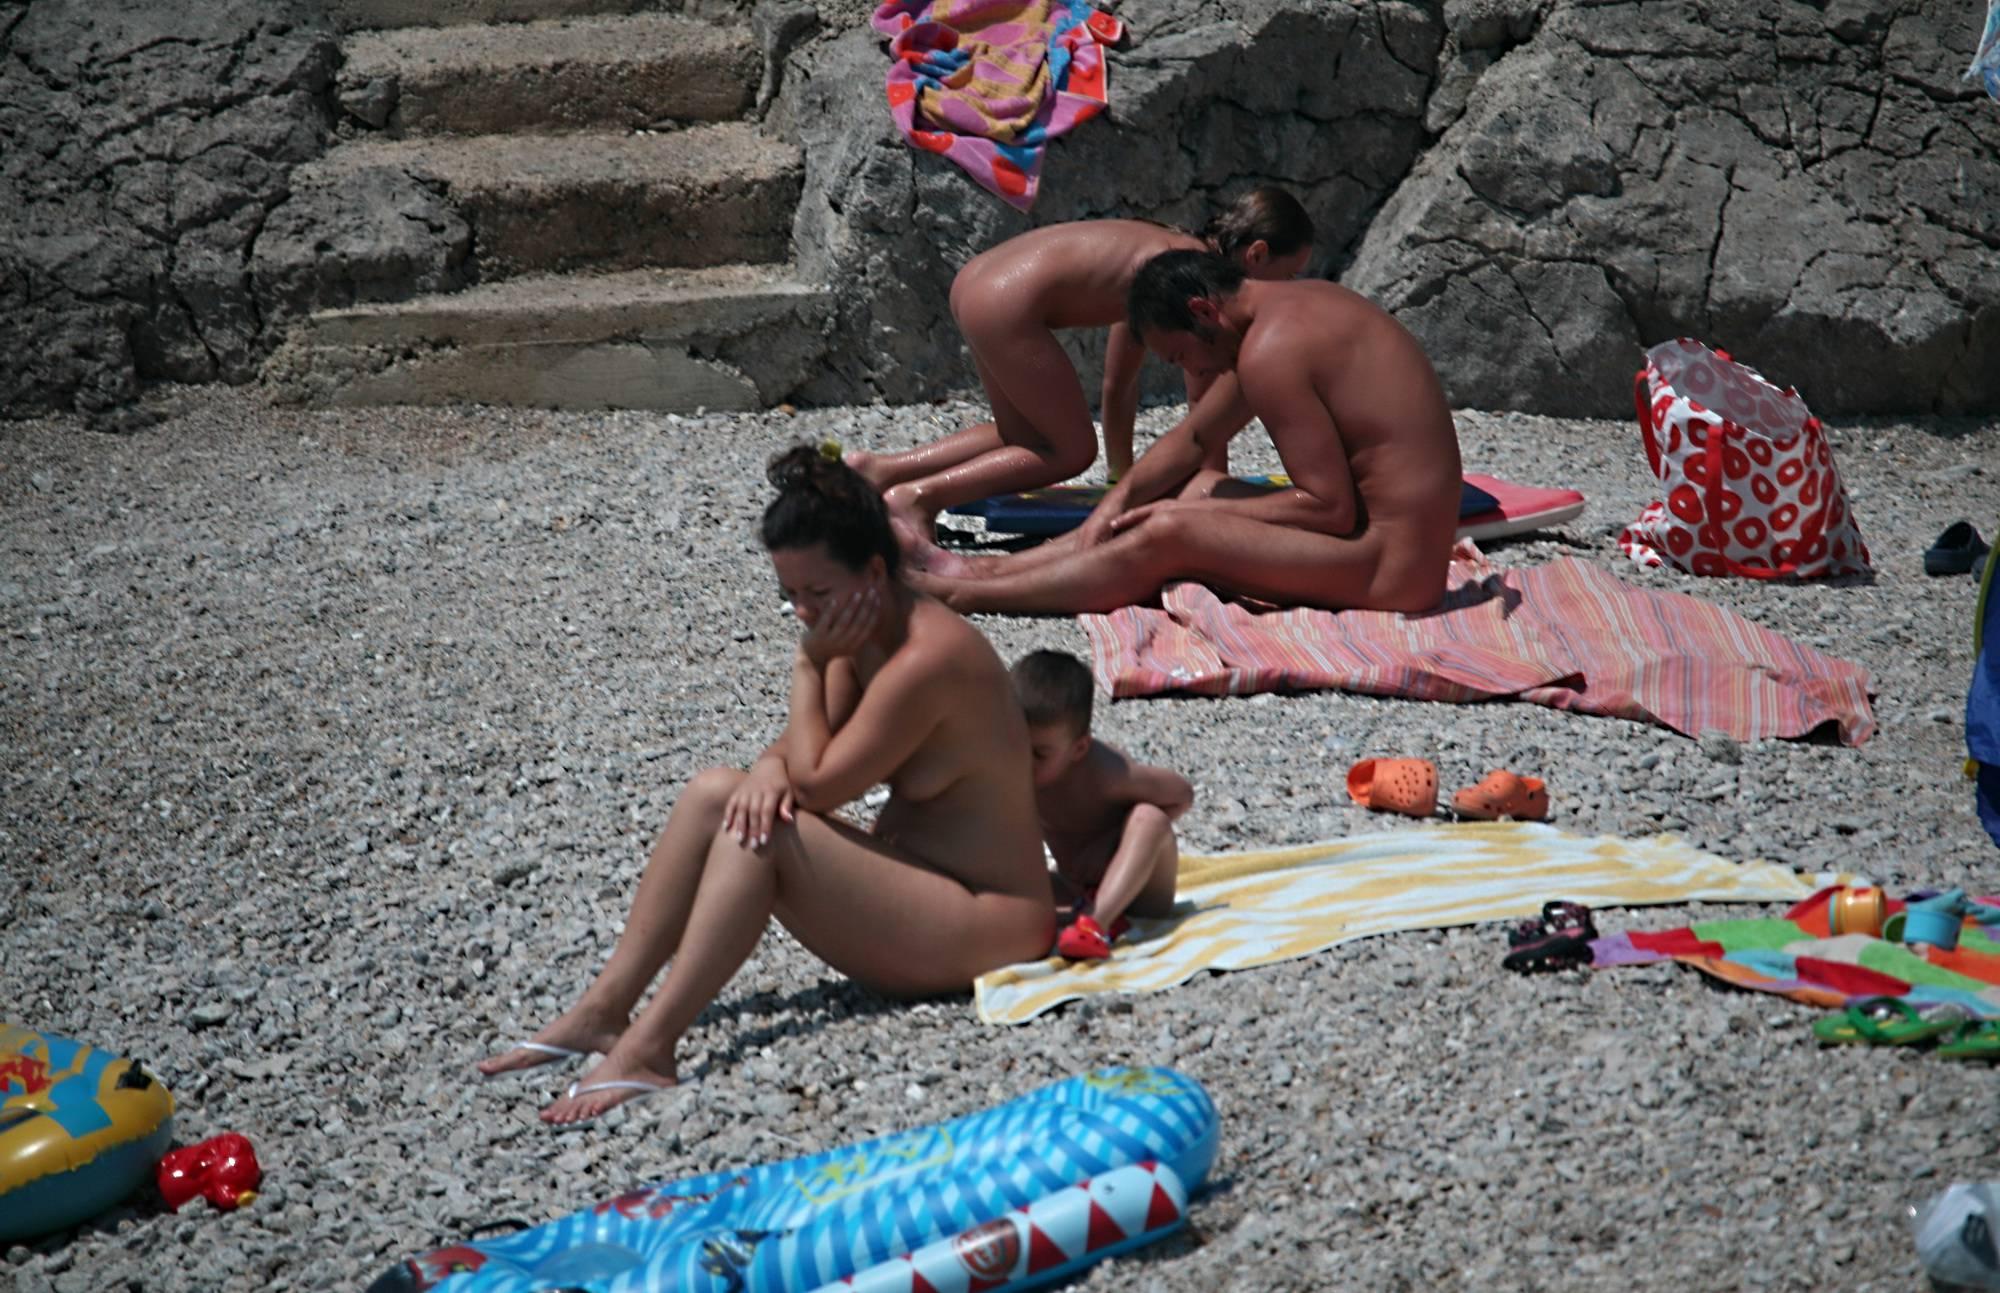 Nudist Pics Surf Board Up The Shores - 1